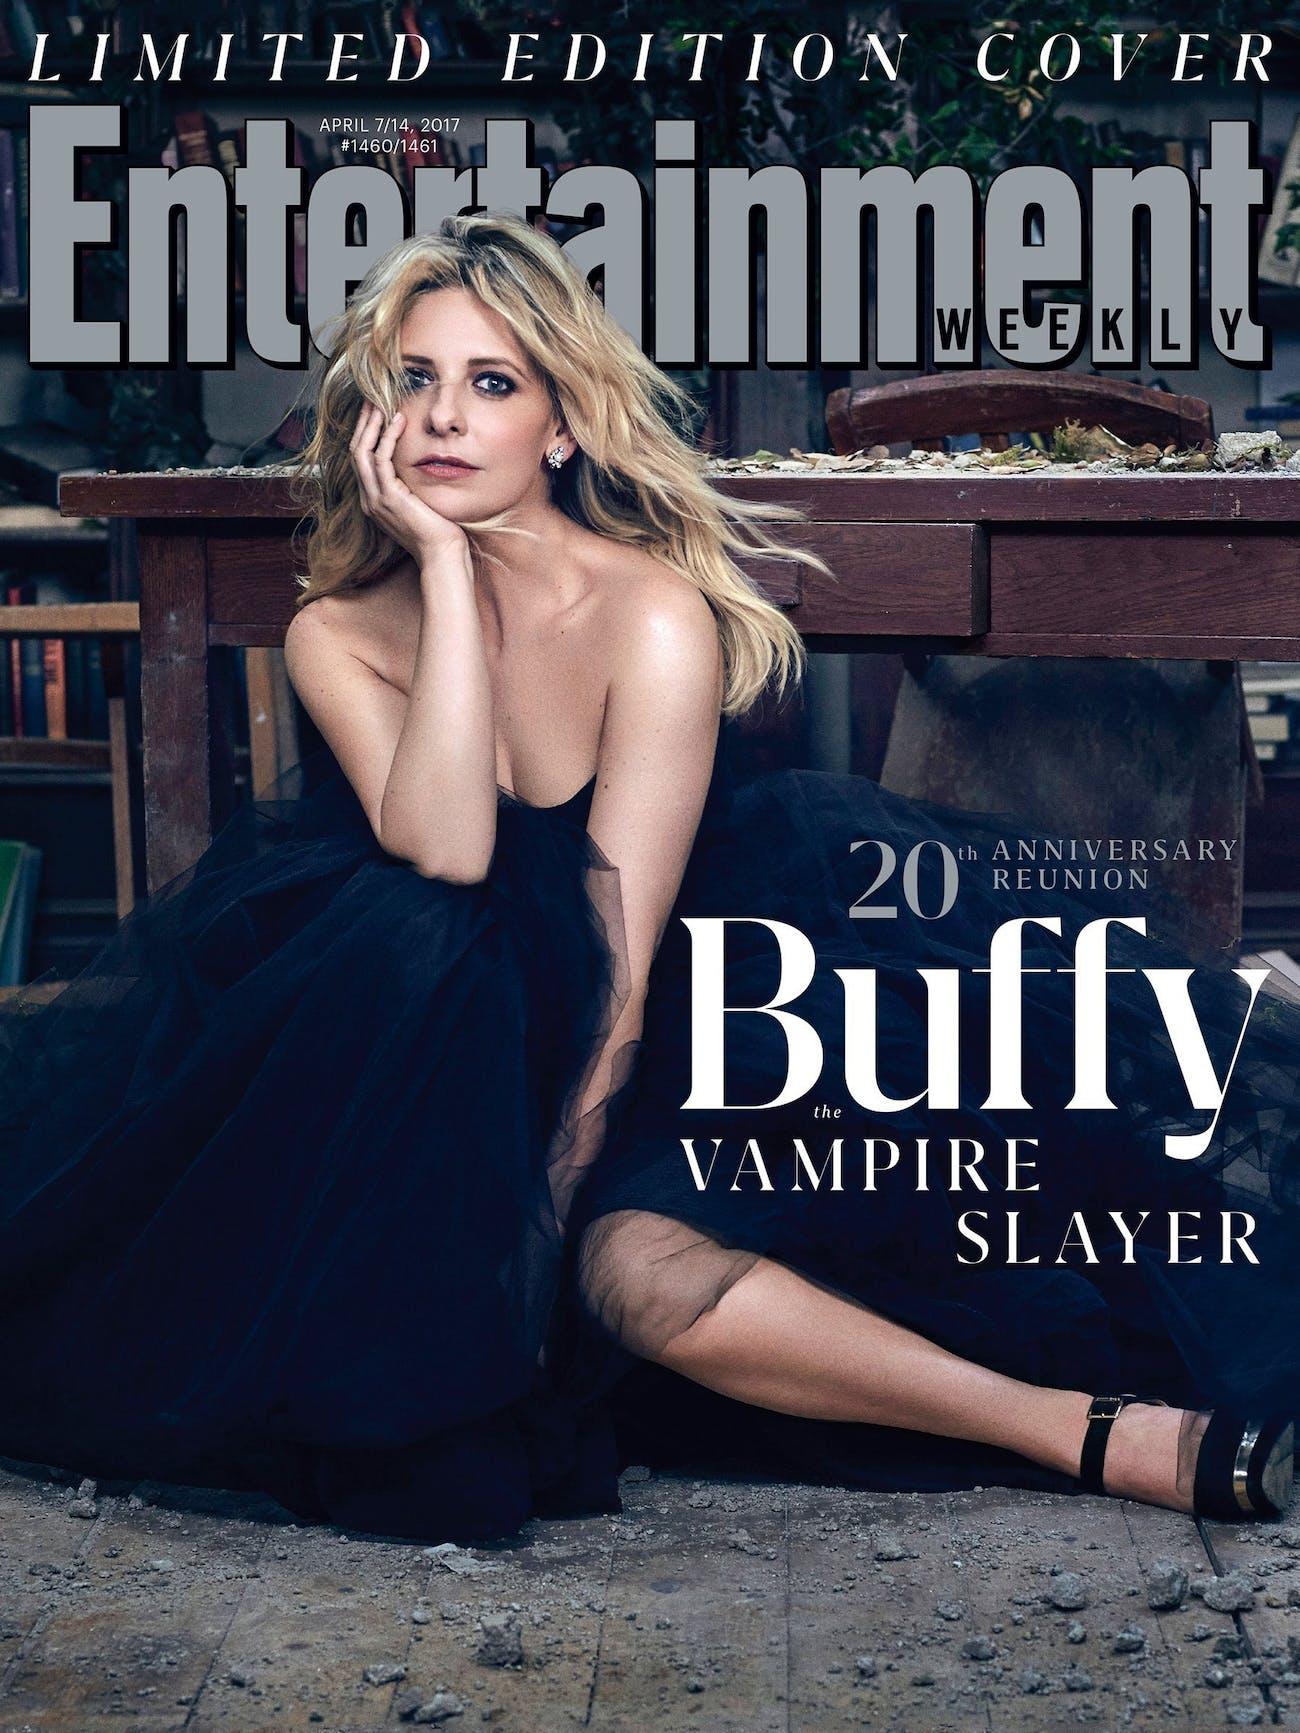 Buffy the Vampire Slayer Reunion